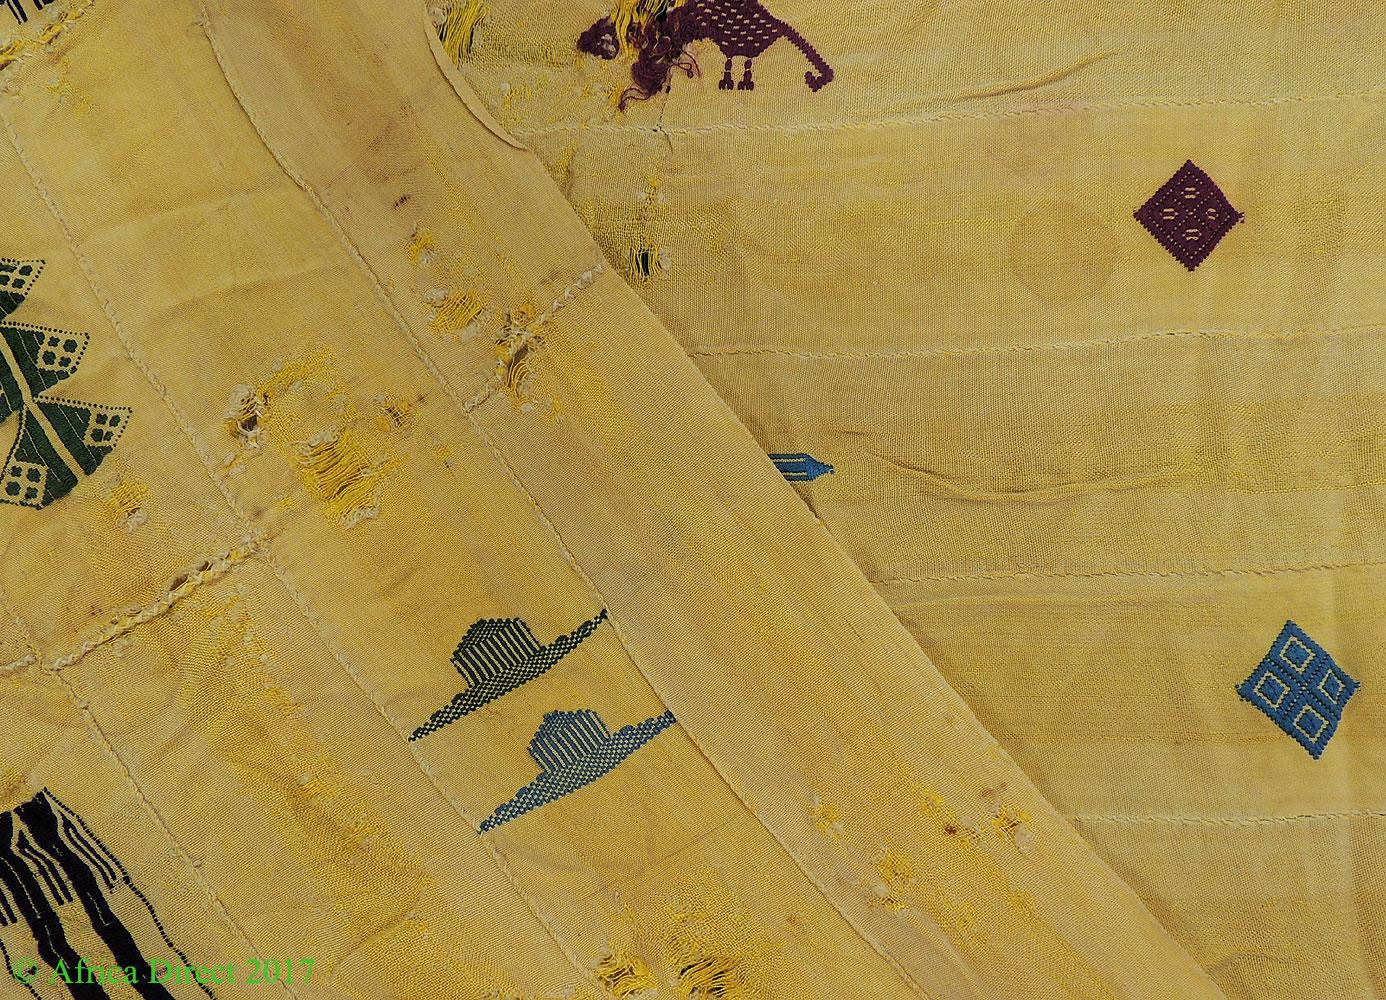 Ewe Silk Cloth Yellow Textile Embroidered Symbols Togo African Art